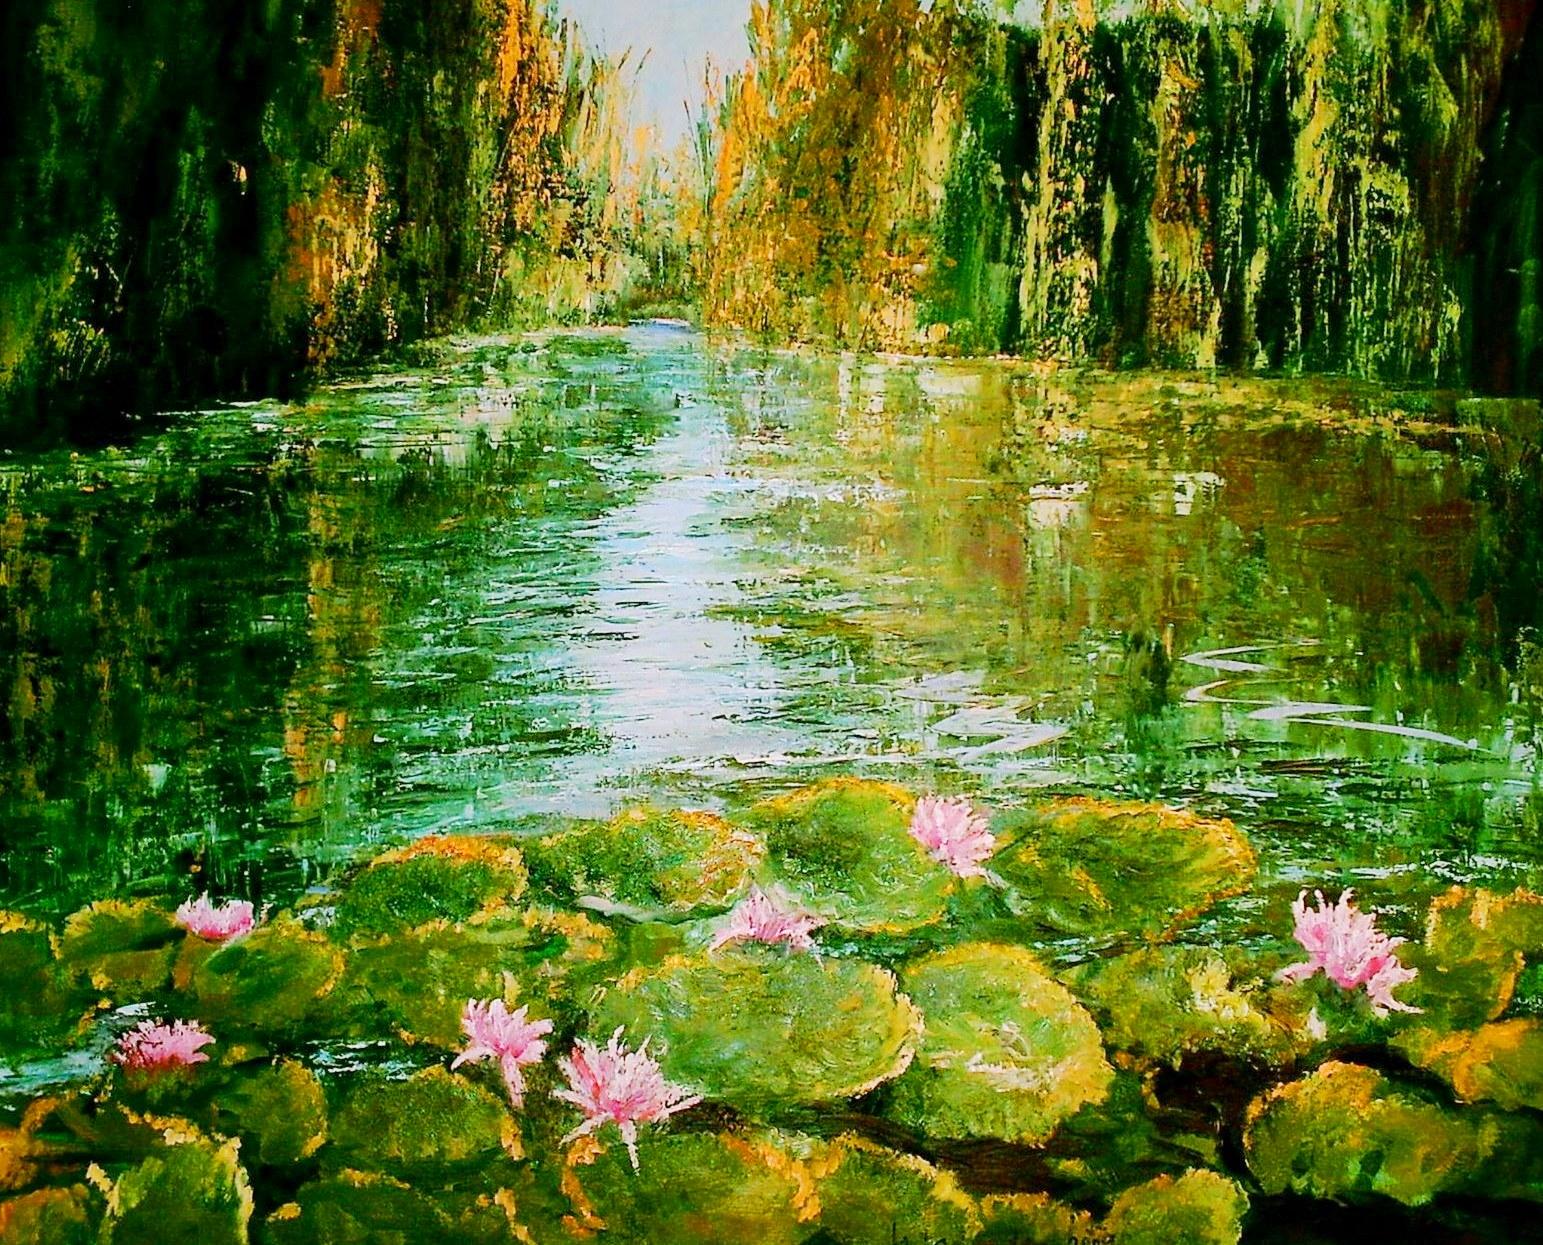 Im genes arte pinturas paisajes naturales leo - Para ver fotos ...